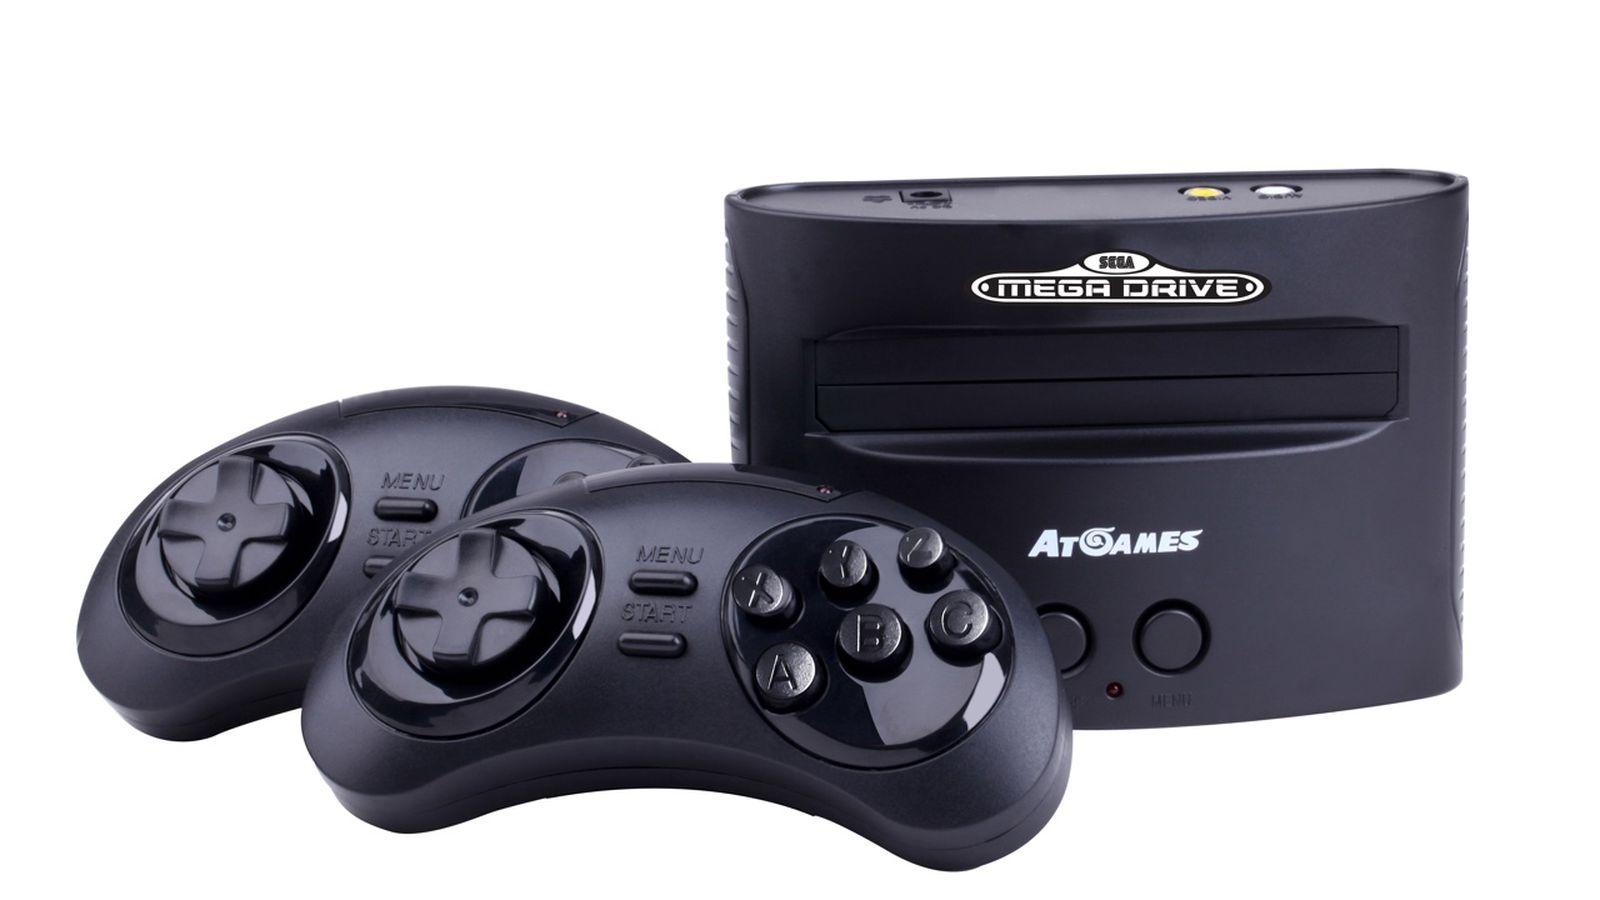 Sega genesis plug and play 80 games casino denies jackpot